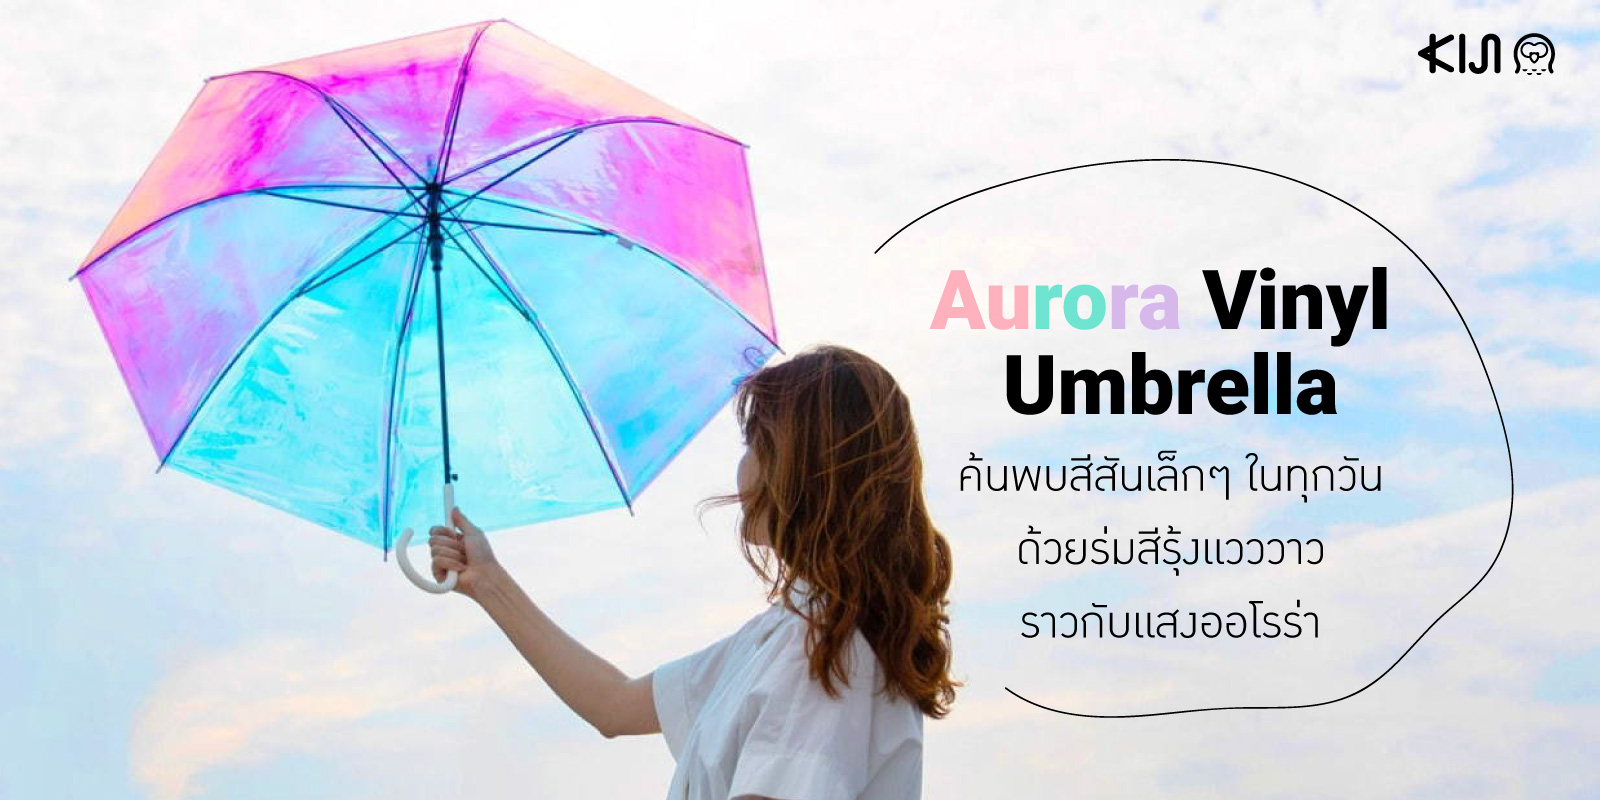 Aurora Vinyl Umbrella ร่มสีรุ้งจากแบรนด์ Wpc.